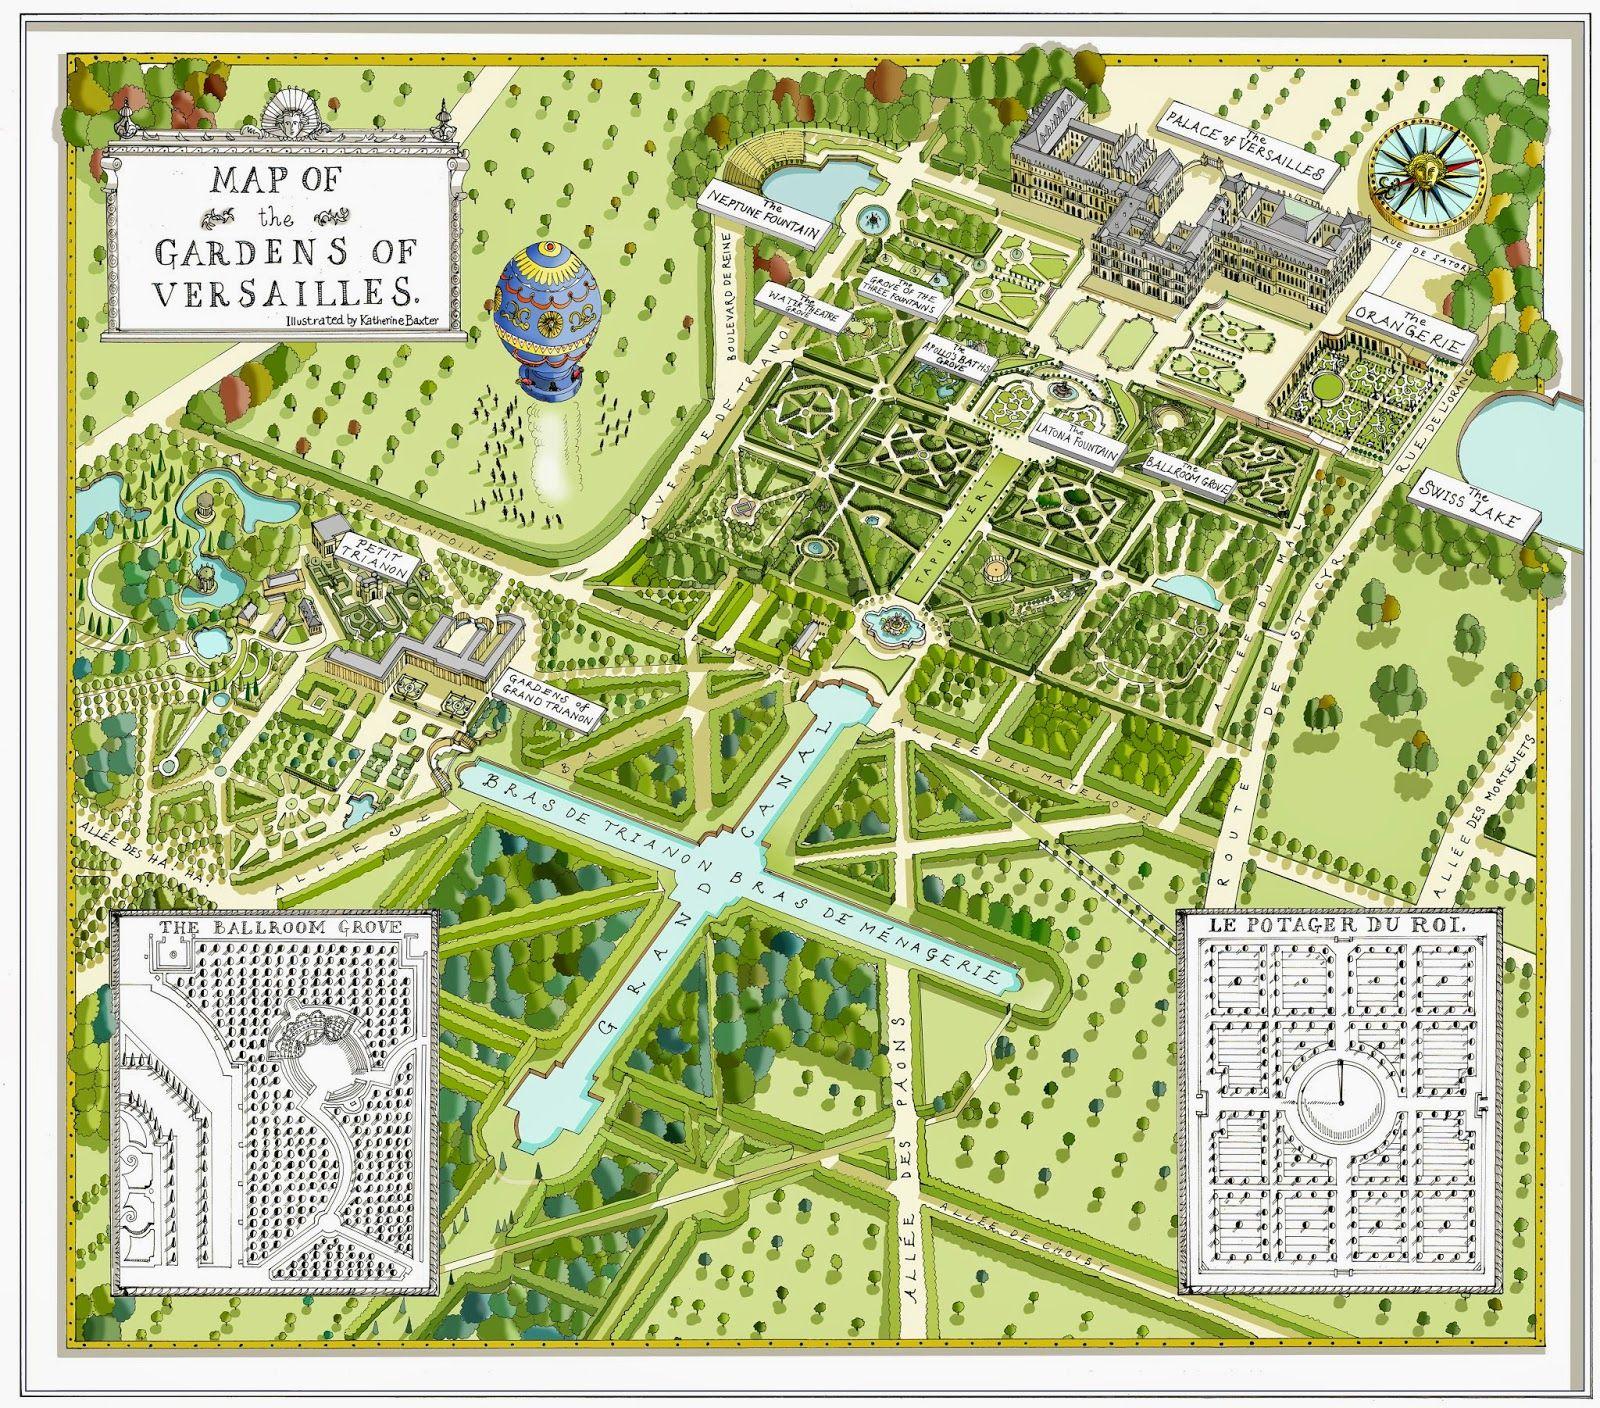 2bf3e7099baaf223b72be8081eb0b820 - Palace Of Versailles Gardens Outdoor Ballroom